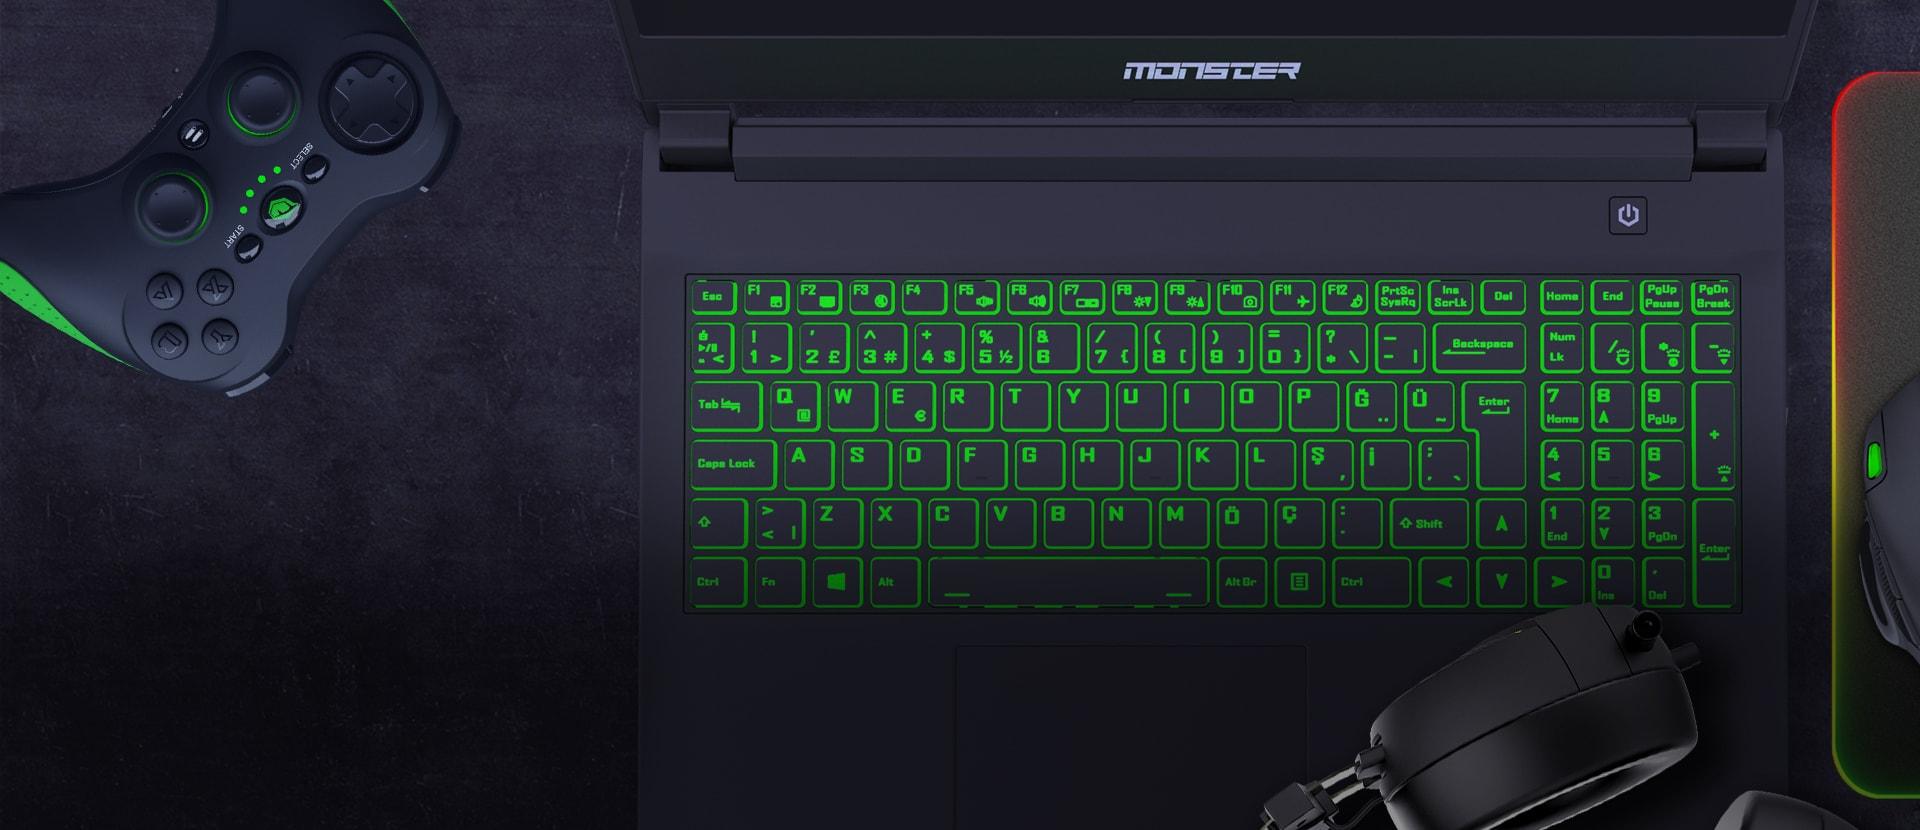 Monster Notebook Abra A5 V16.5